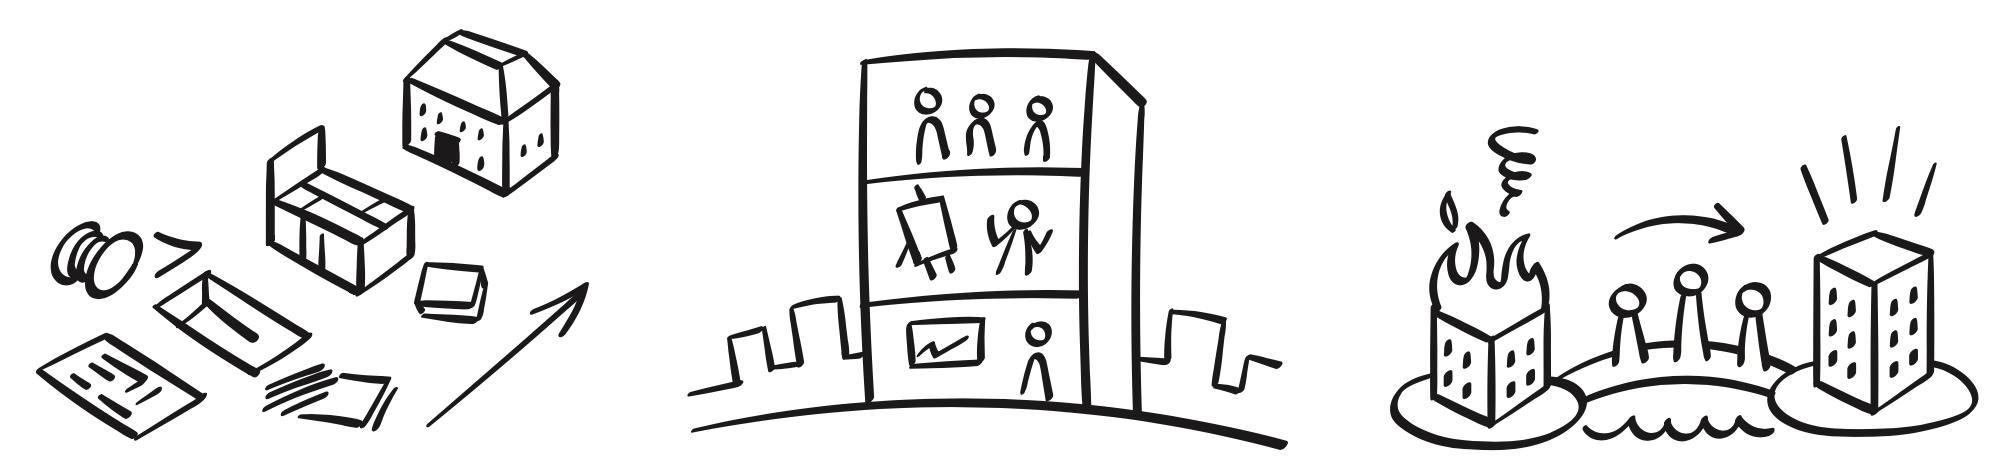 framework-metaphors